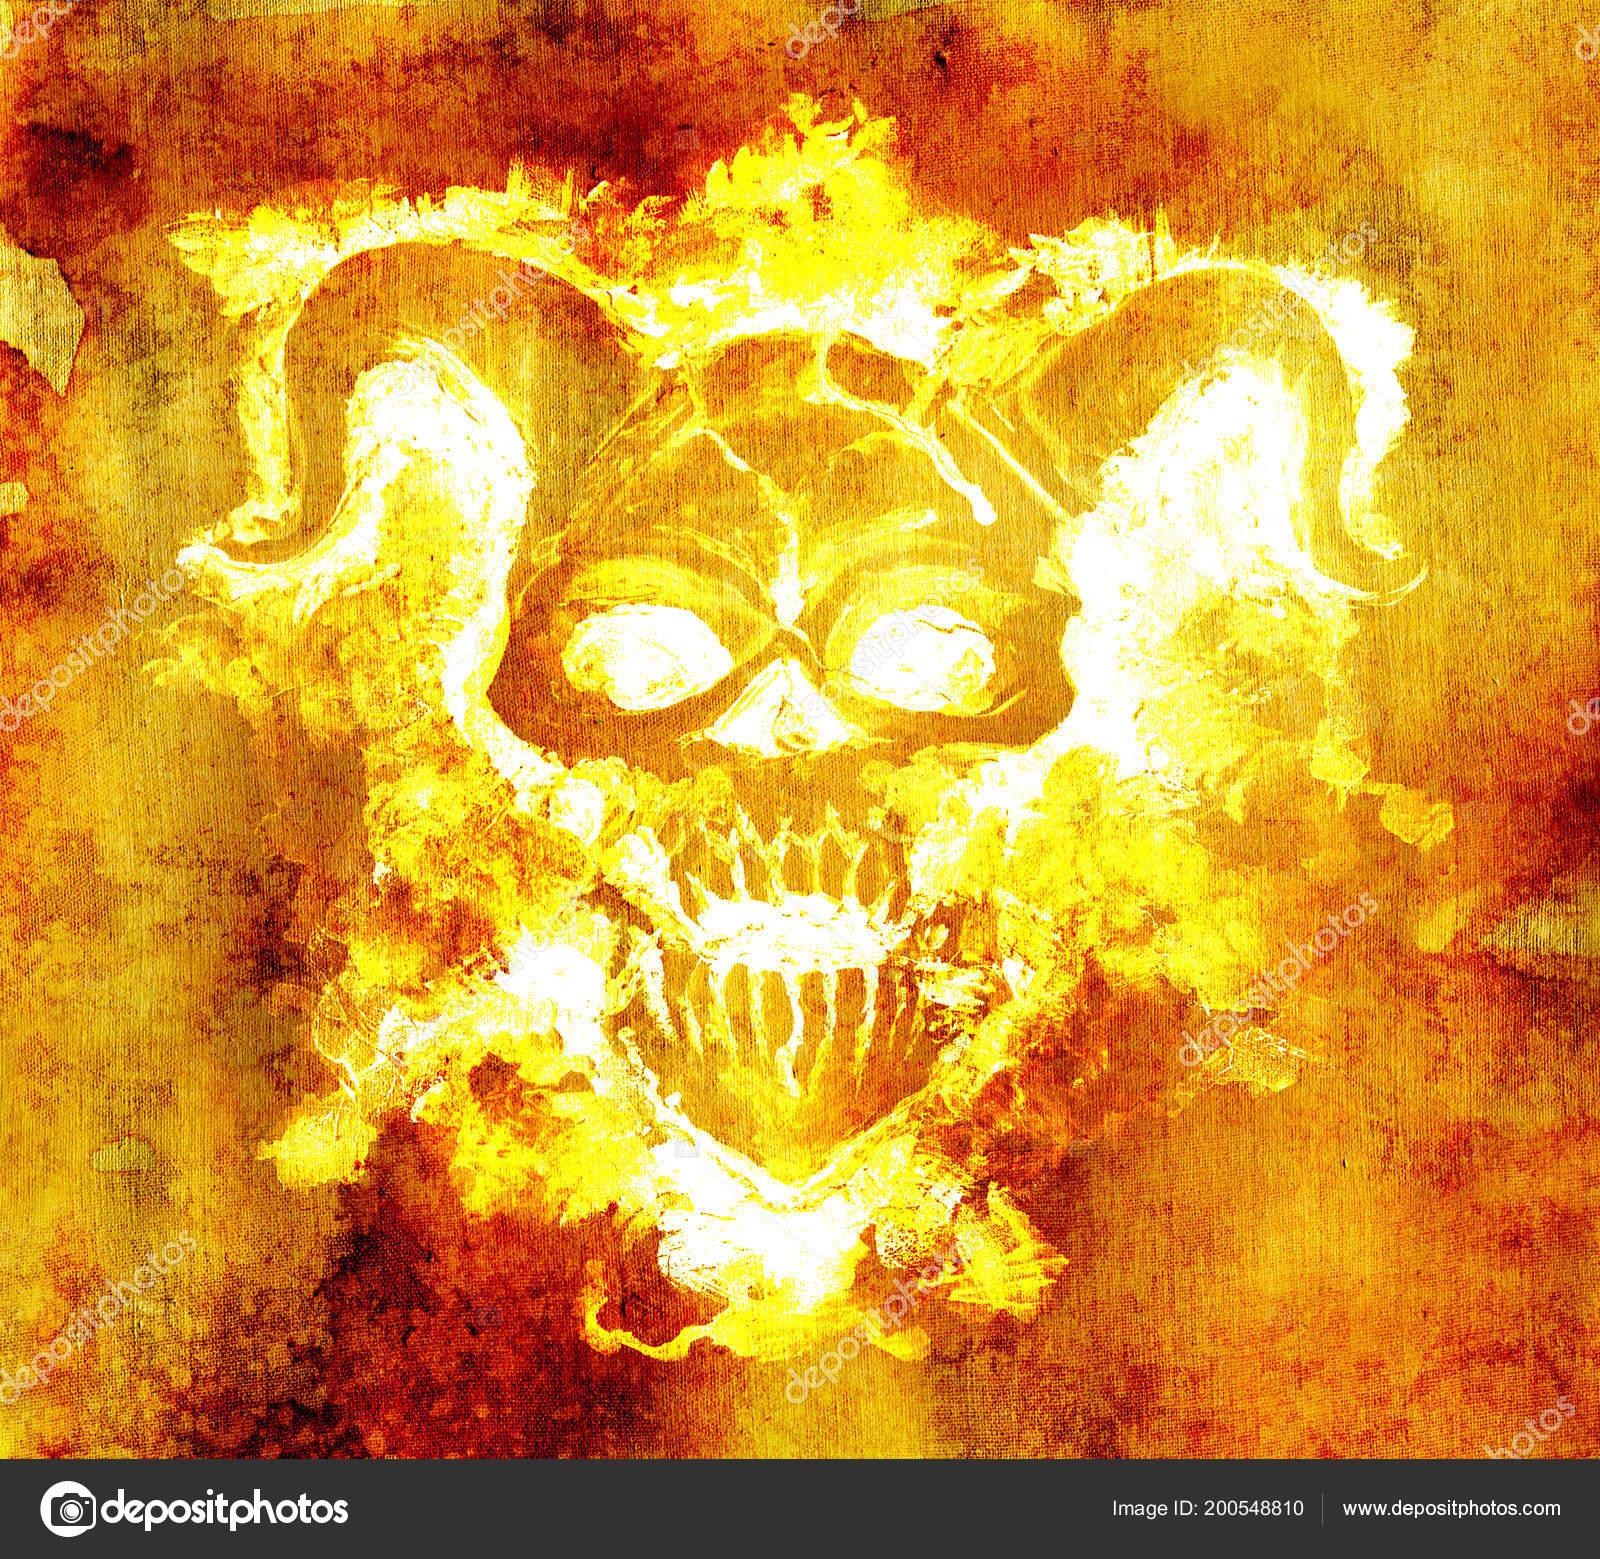 Devil Hell Flame Grunge Texture Background Death Symbol Black Magic